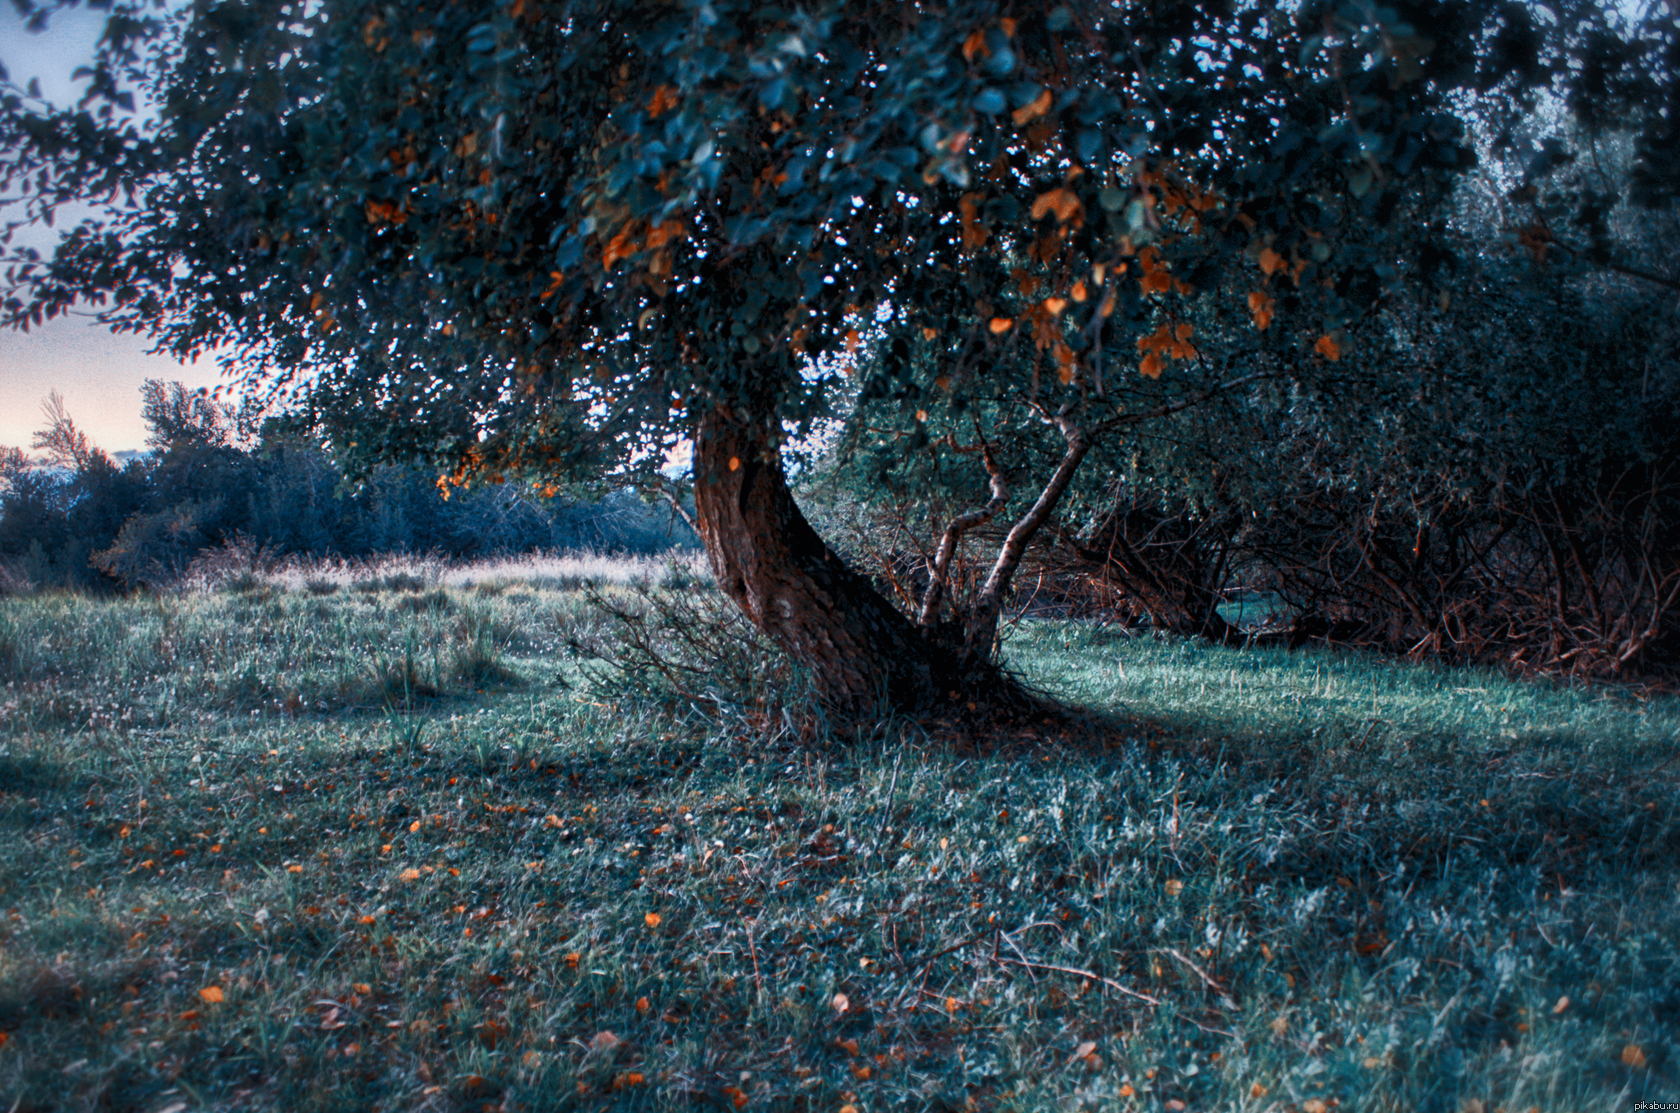 Сказочный лес: pikabu.ru/story/skazochnyiy_les_680710